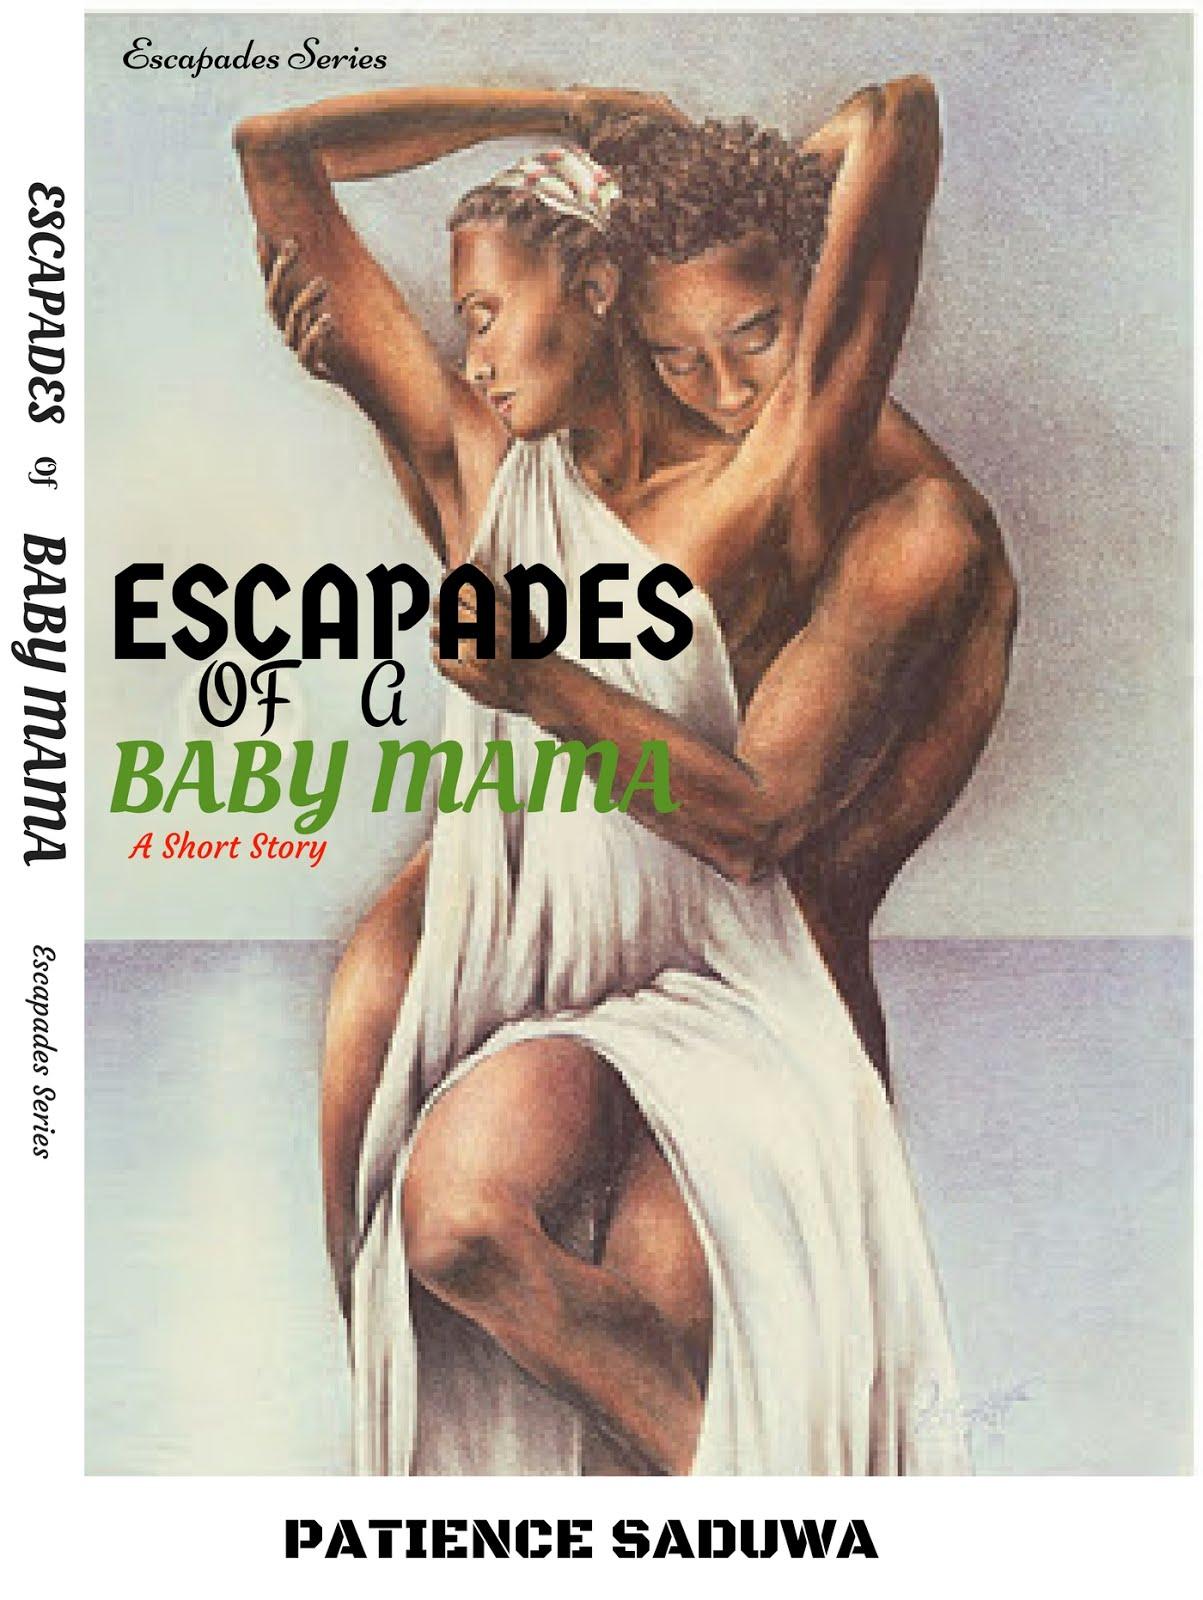 Escapades of a Baby Mama by Patricia Saduwa